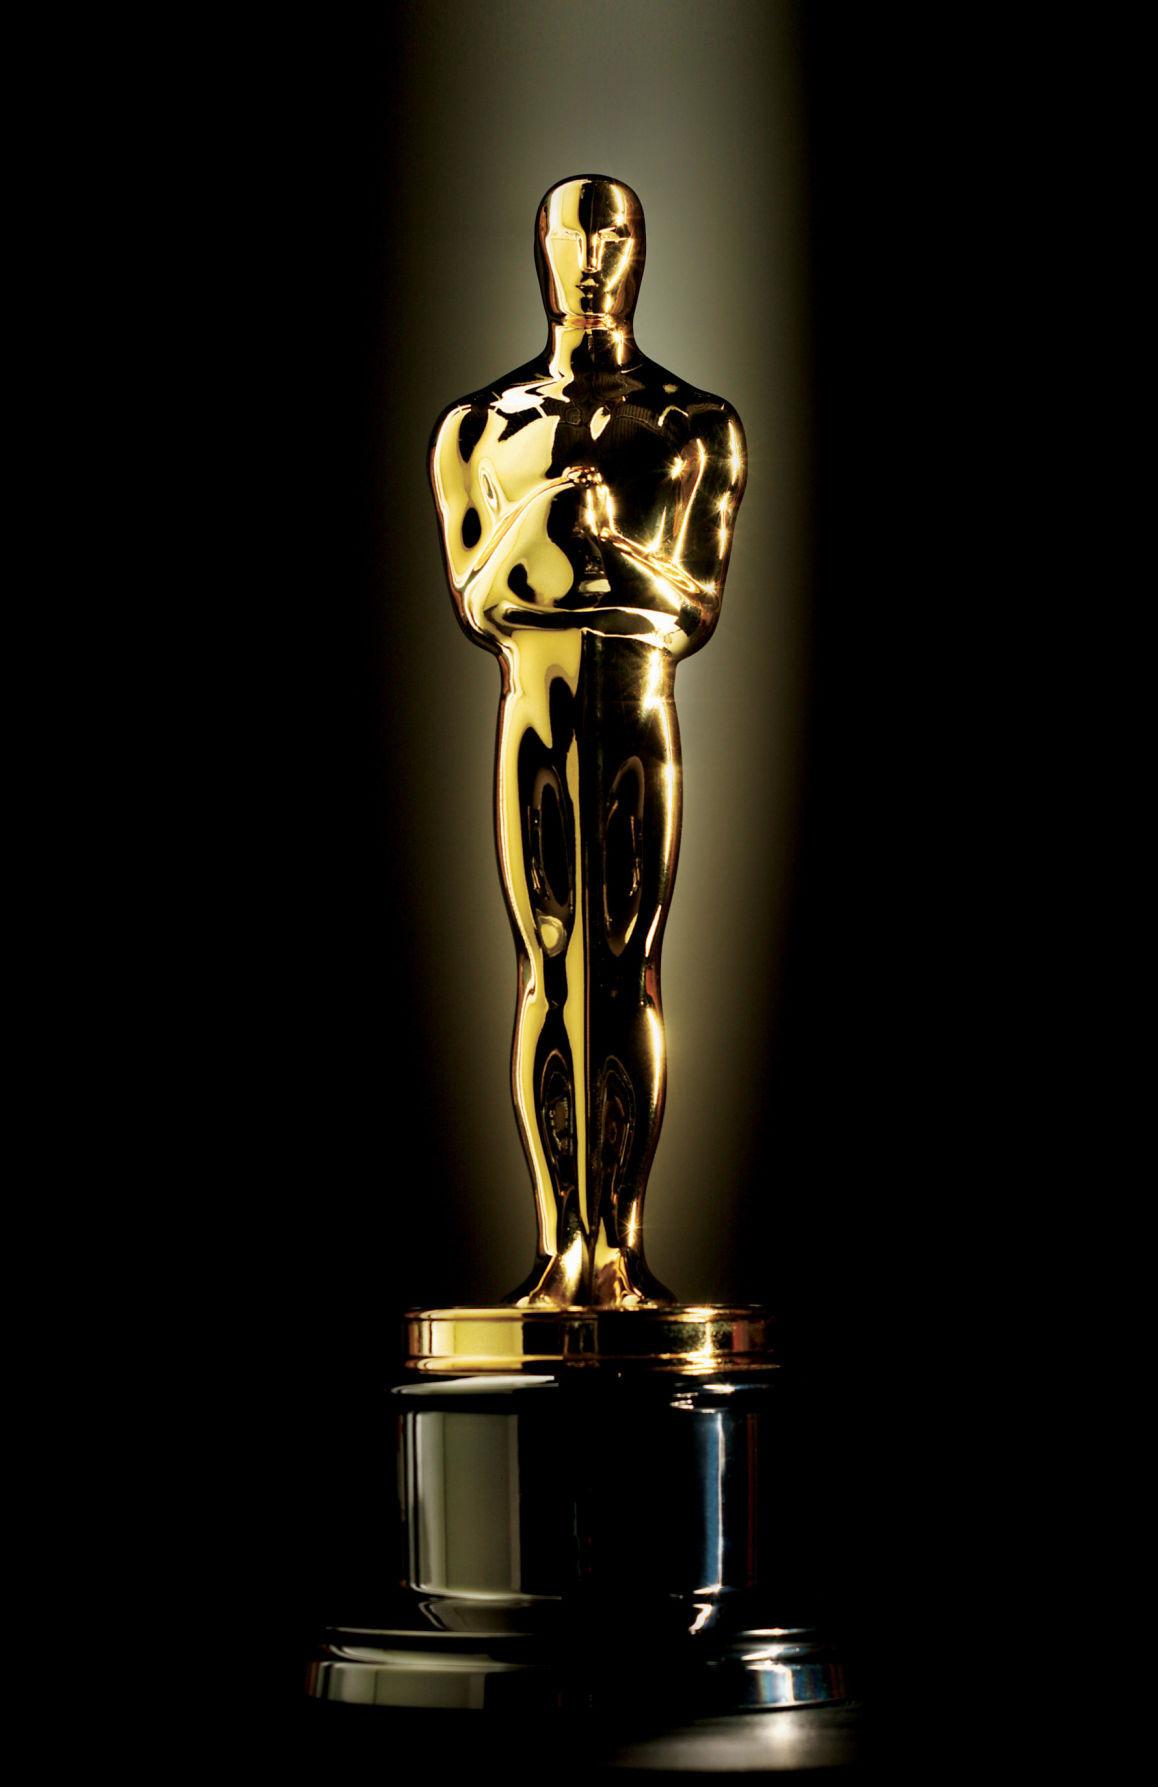 academy-award-statuette.jpg